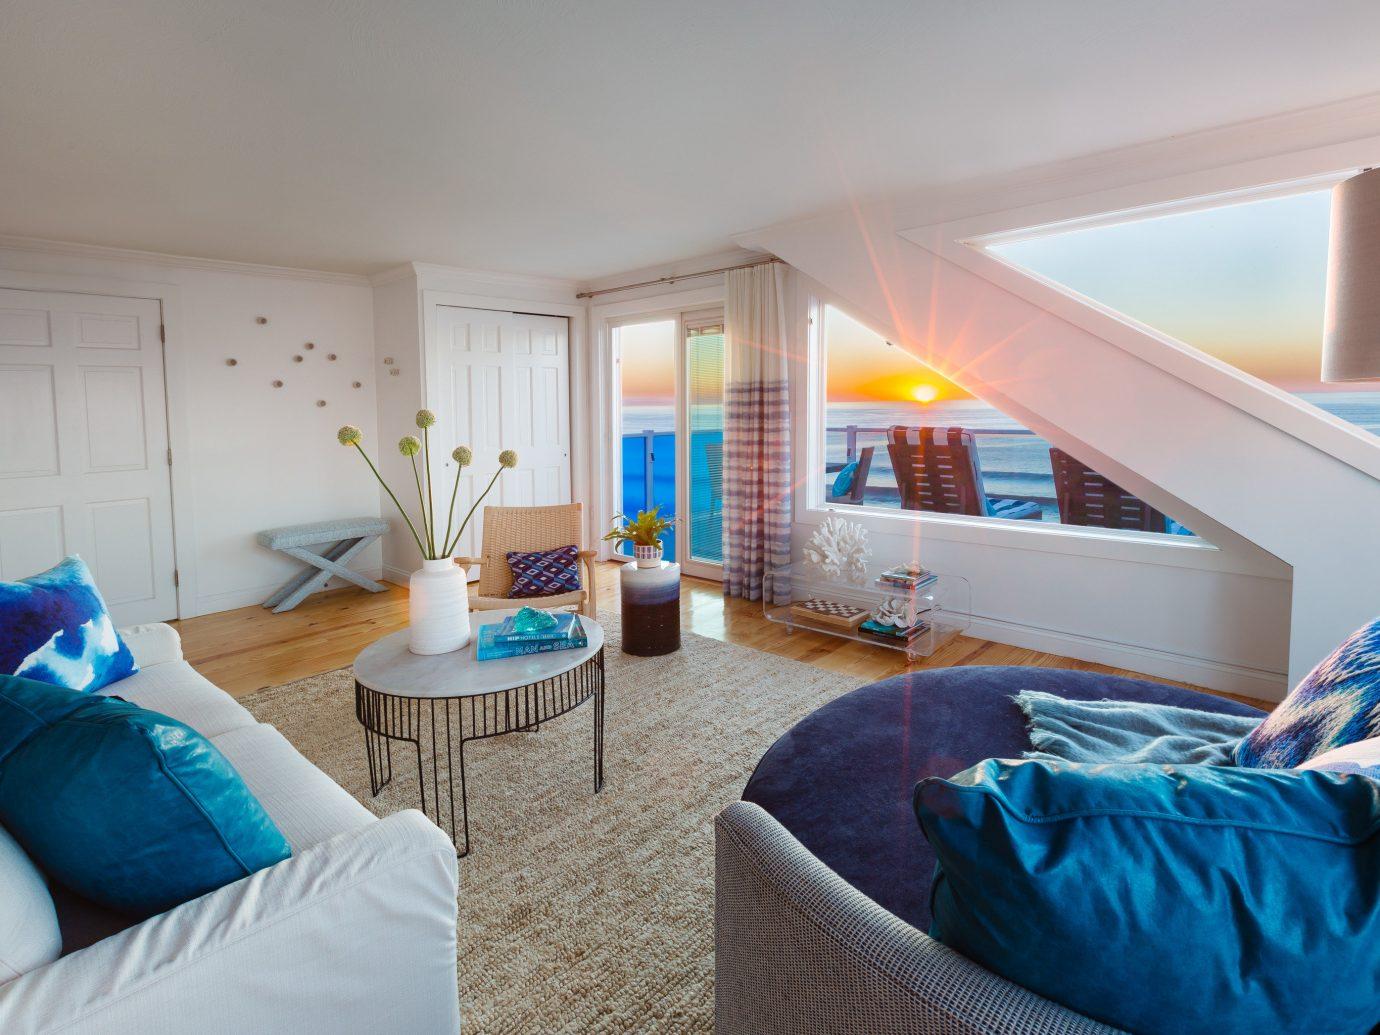 Romance Trip Ideas Weekend Getaways indoor wall bed ceiling room blue floor property Bedroom house living room home estate real estate cottage Villa Suite apartment furniture